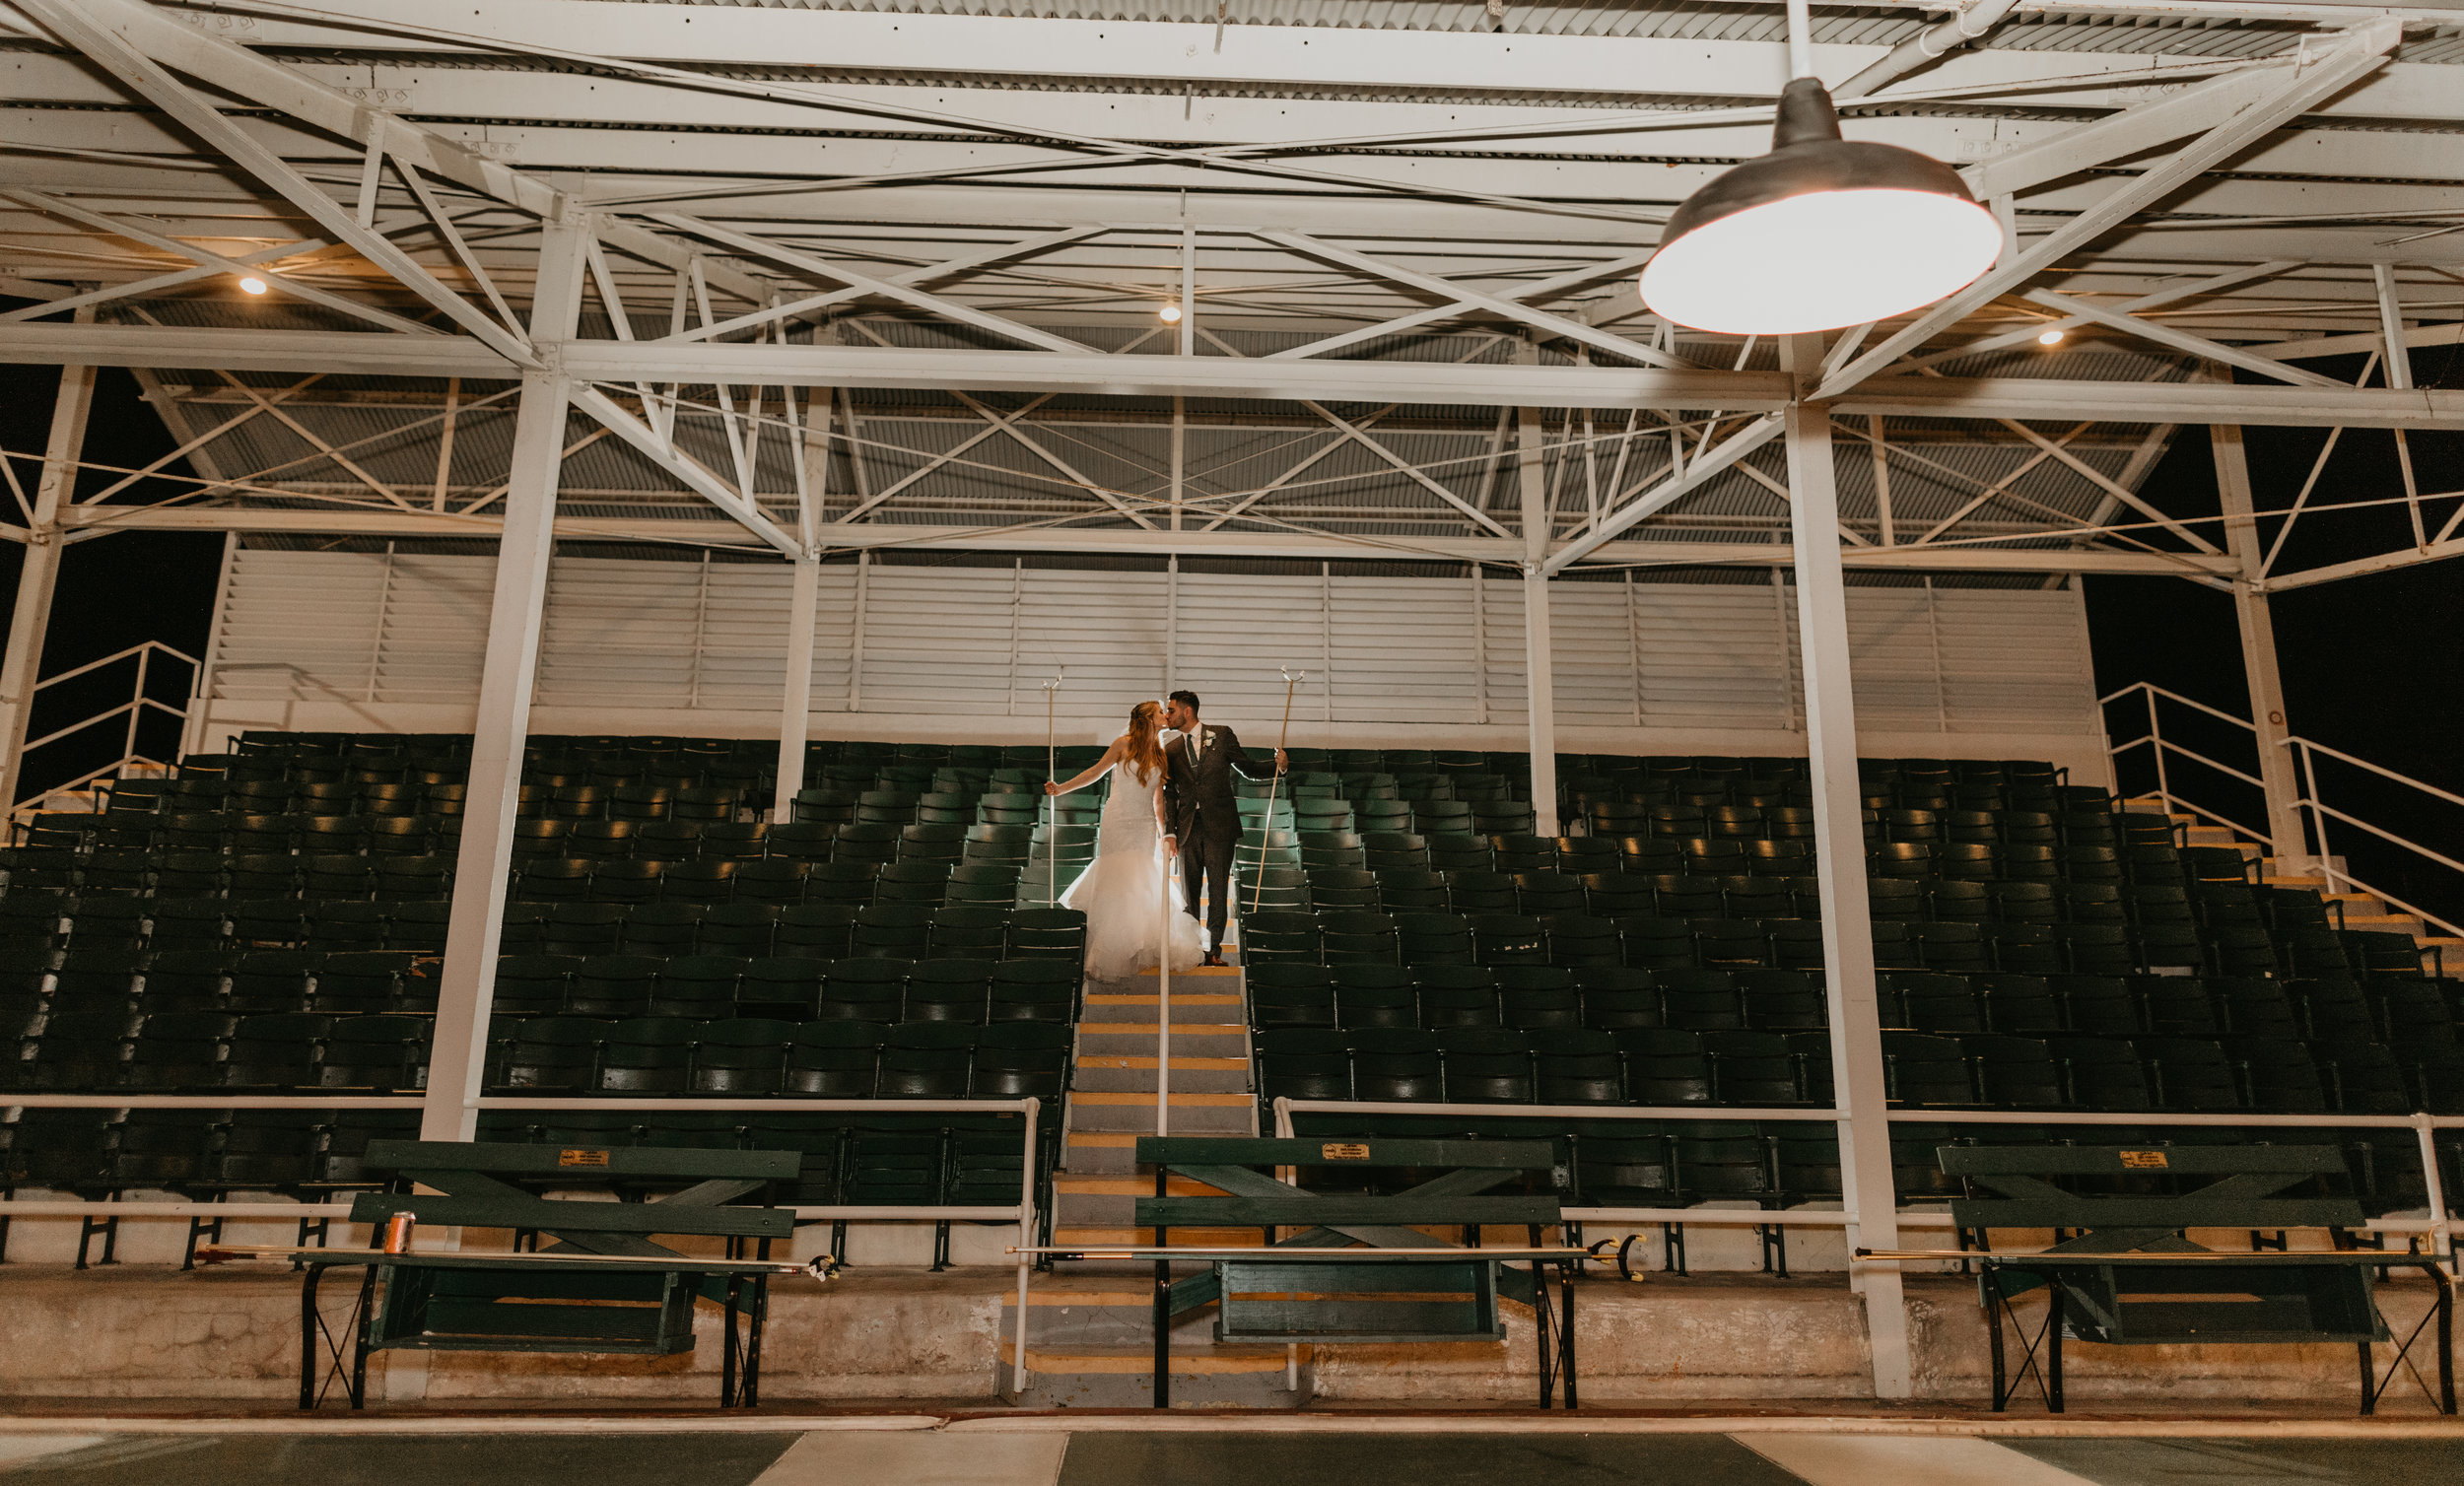 St Petersburg Shuffleboard Club St Petersburg Florida-Wedding- Rachel and Michael98.JPG